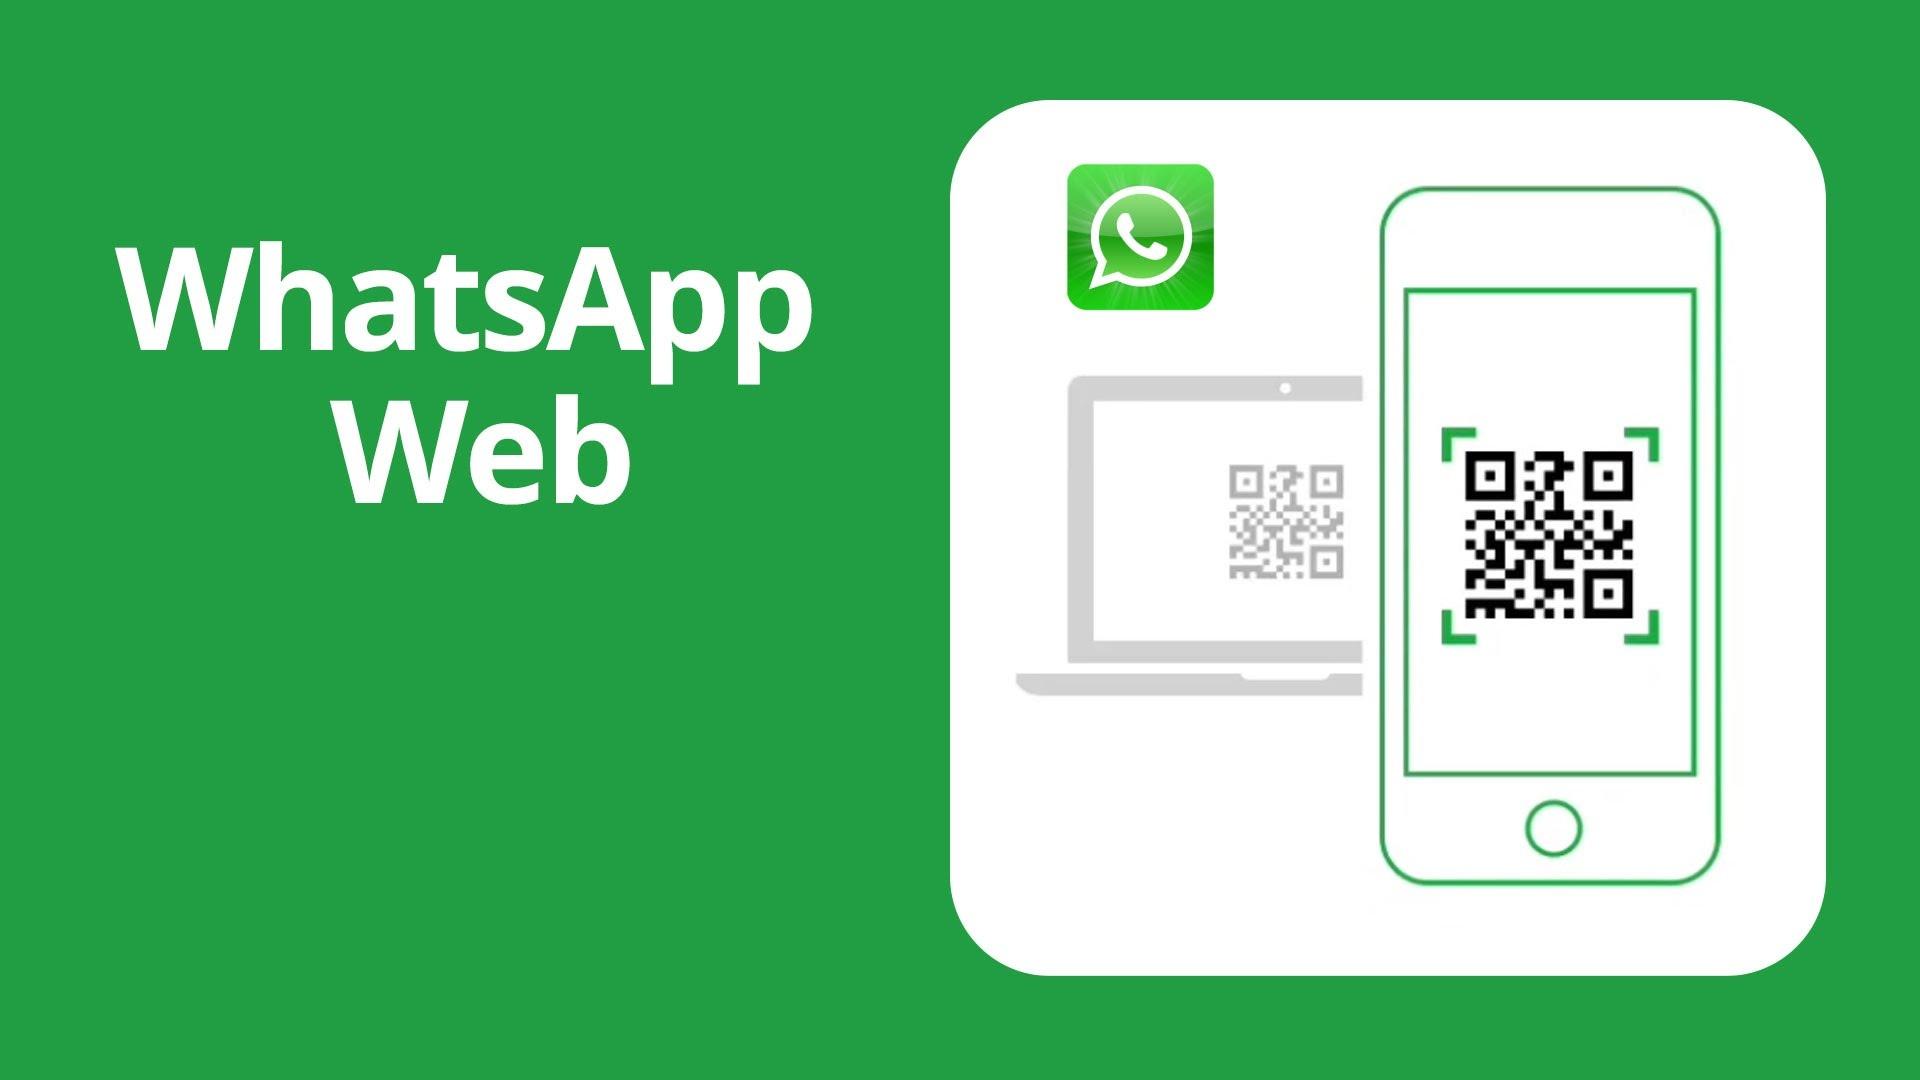 Comment installer whatsapp sur pc windows